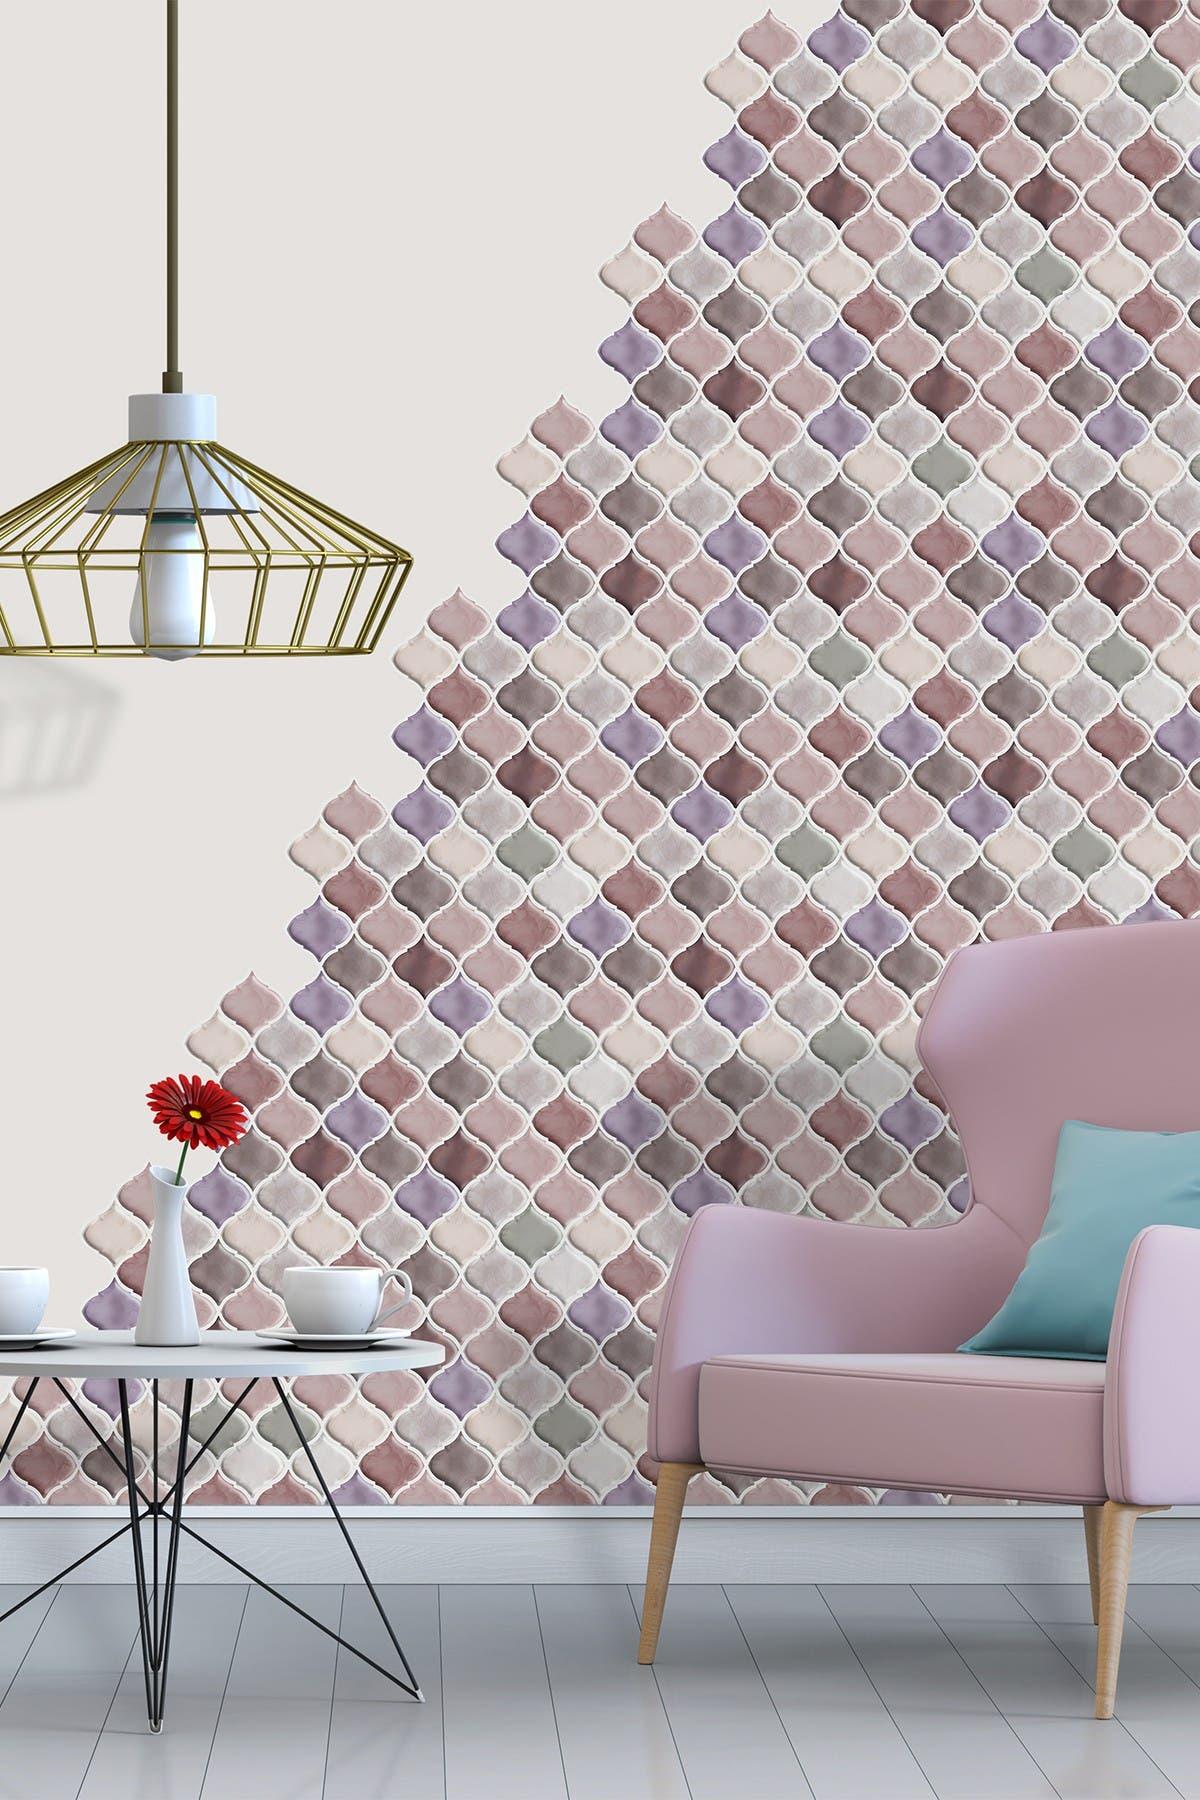 "Image of WalPlus Arabesque Old Rose Mocha 3D Sticker Tile - 11 x 8"""